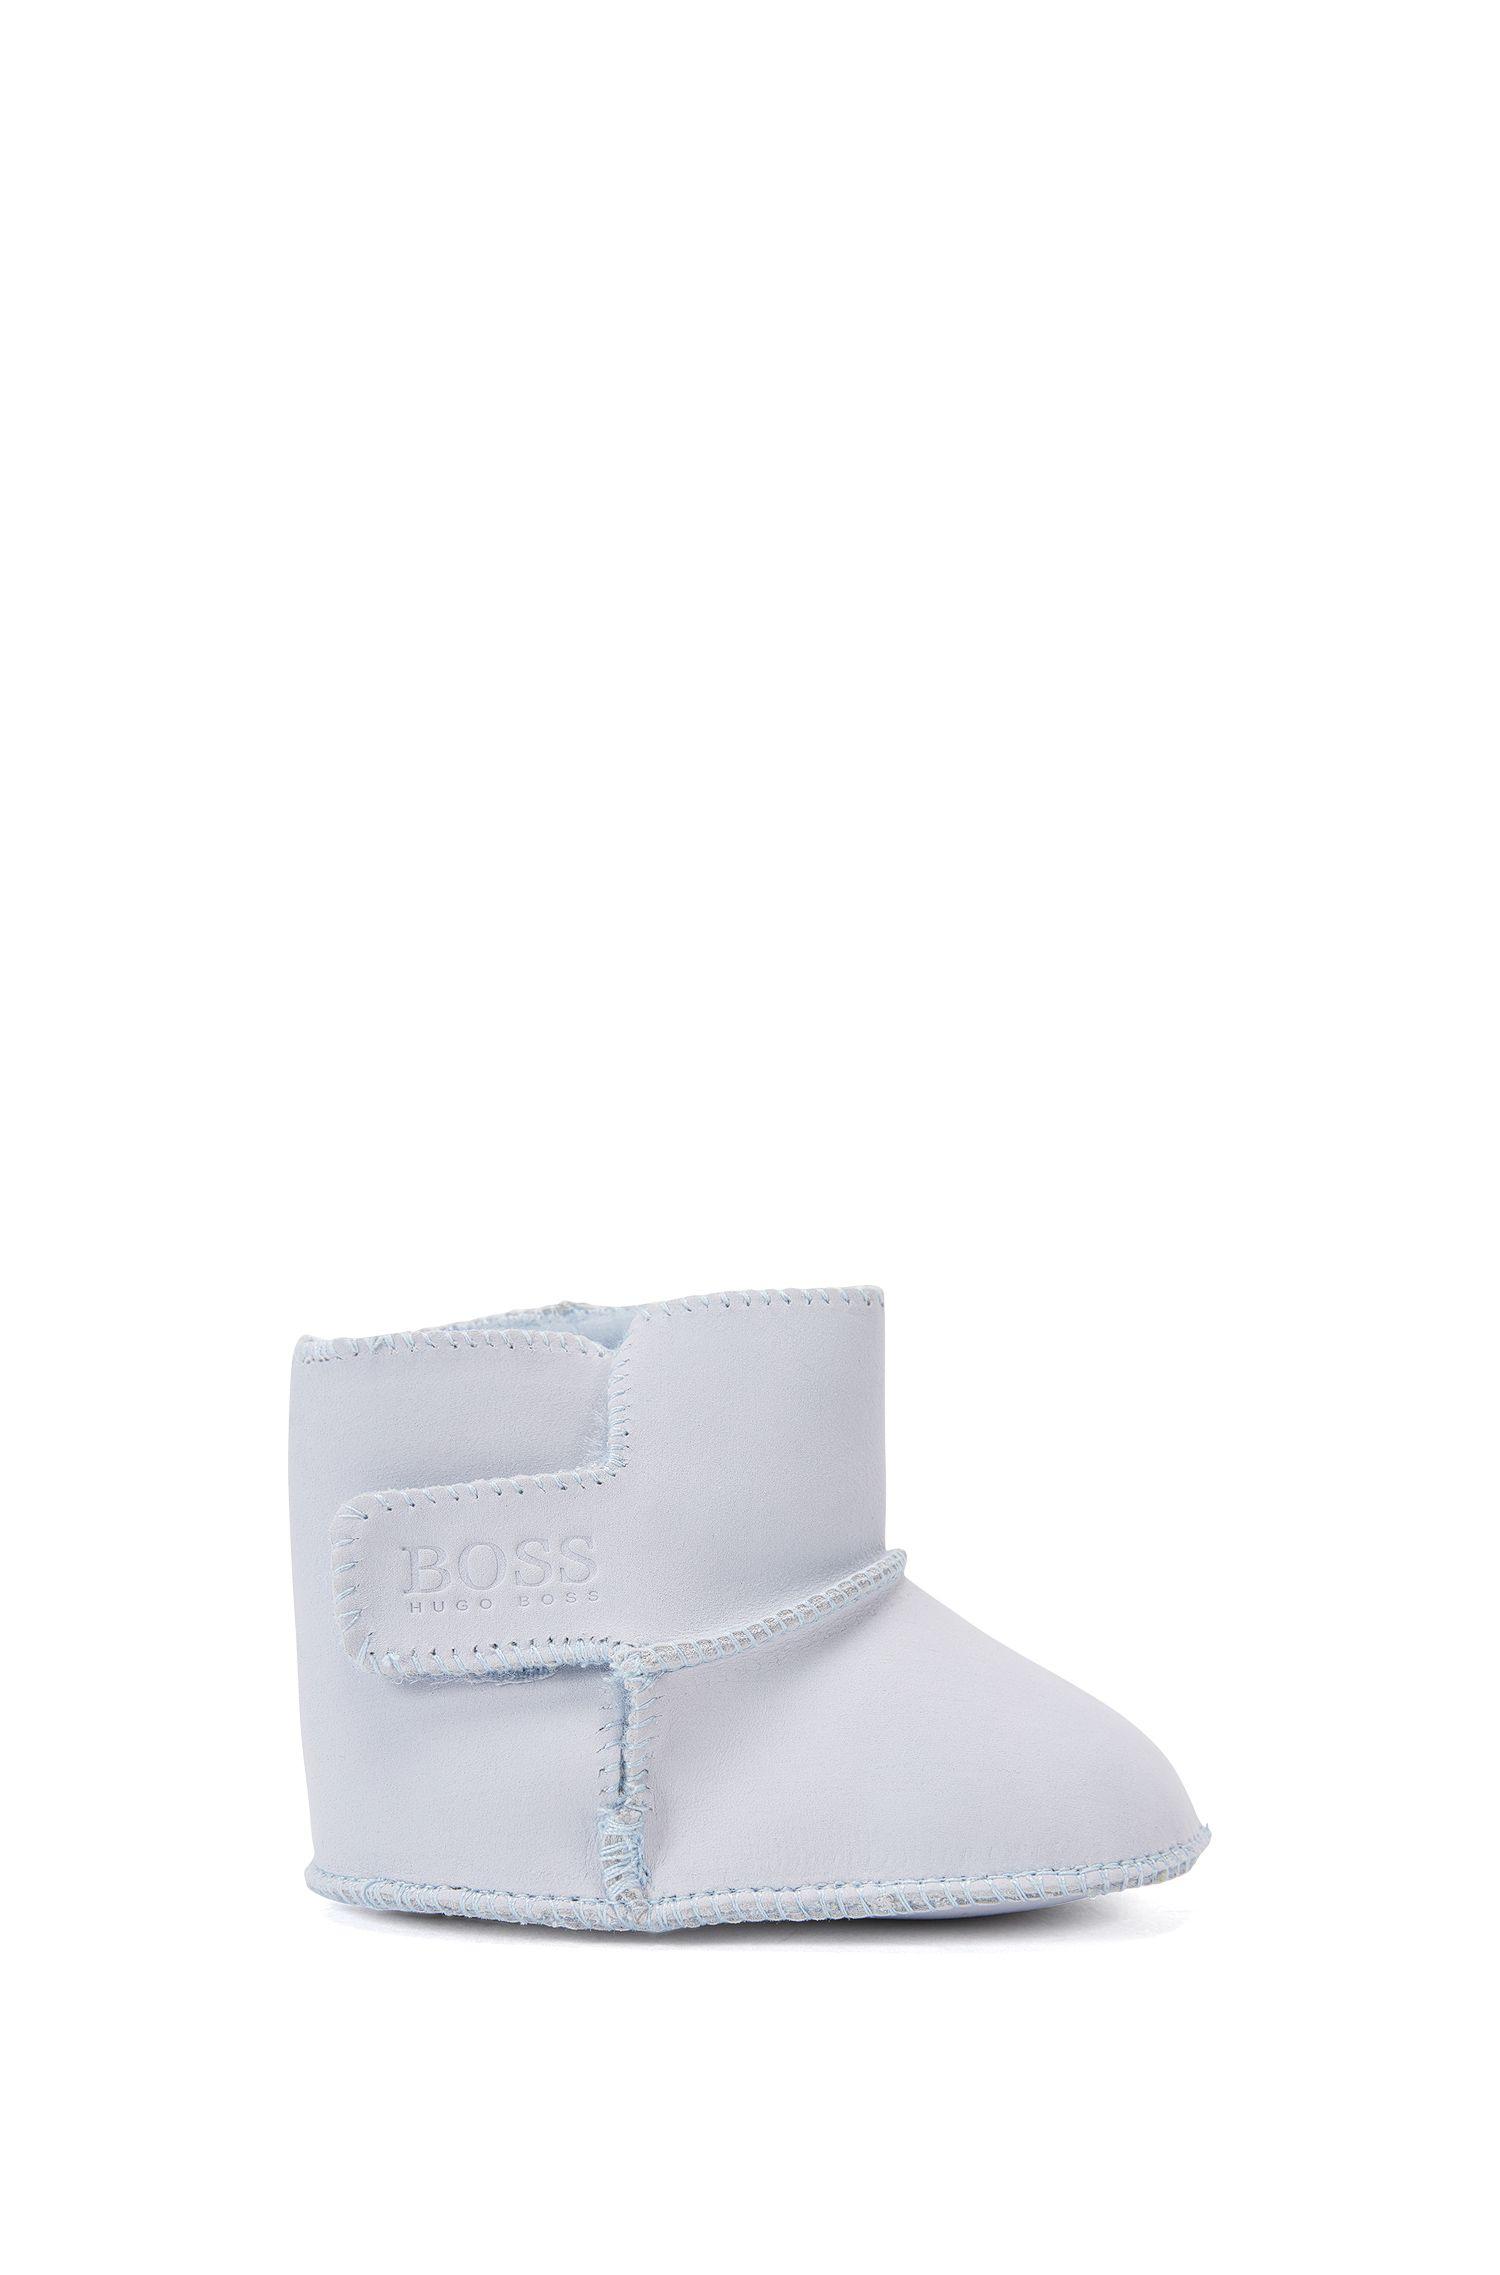 'J99048' | Newborn Cotton Booties